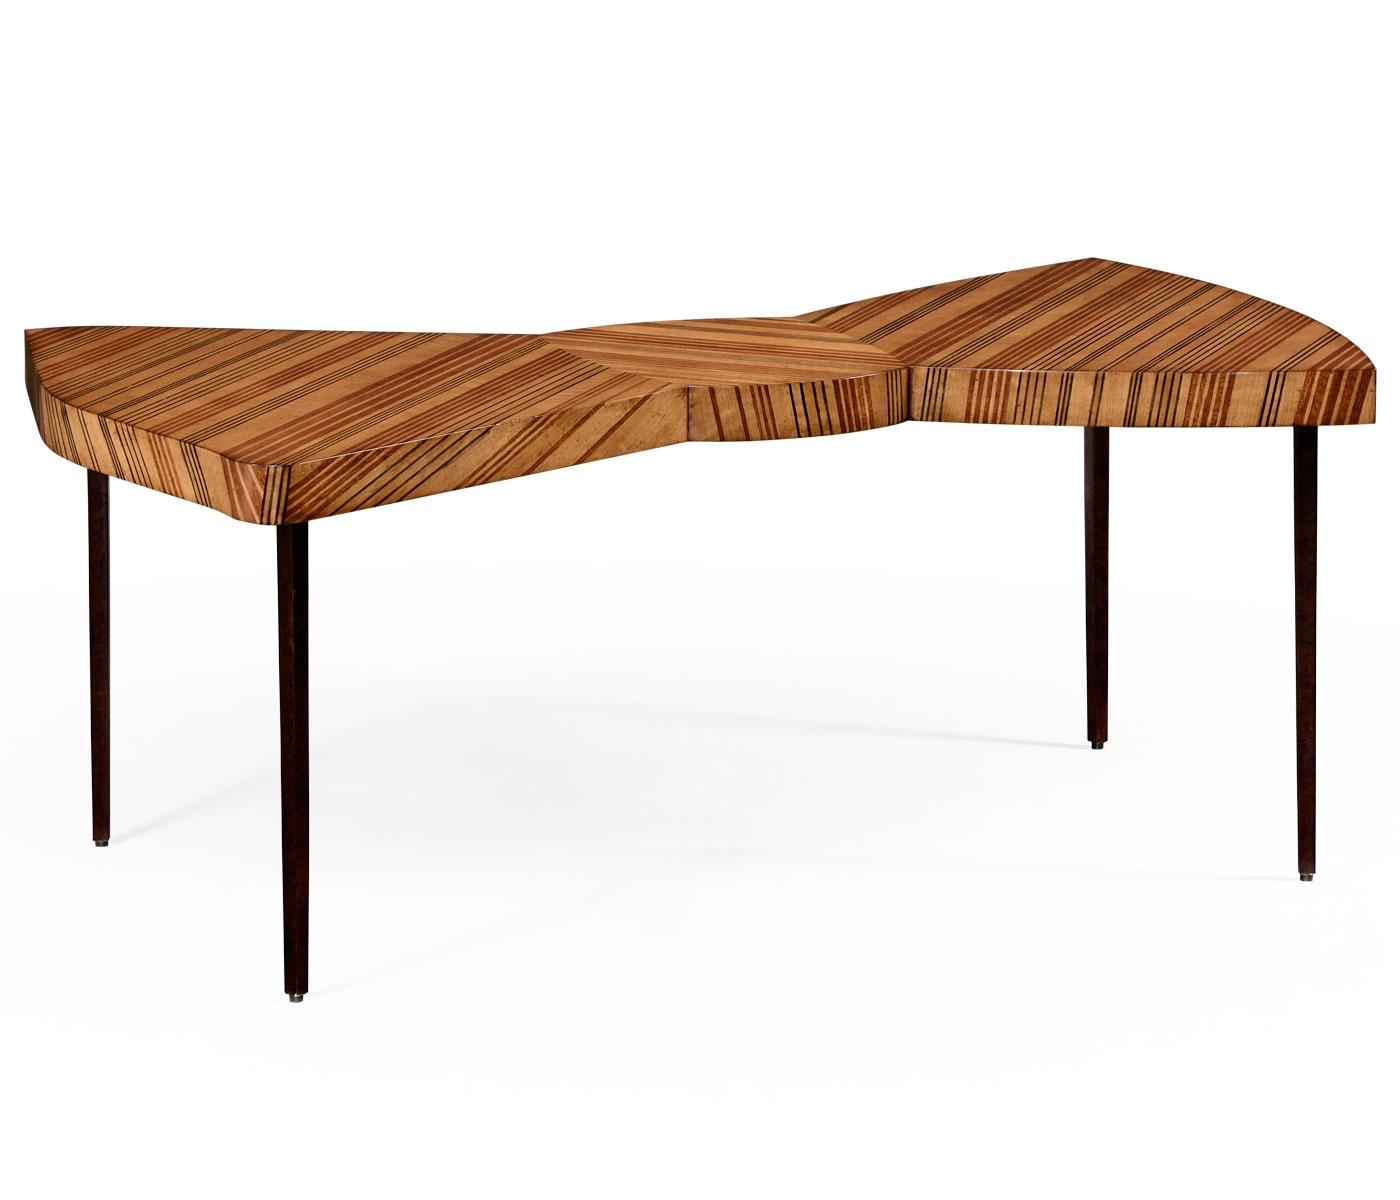 Alexander Julian Furniture Designer Bow Tie Coffee Table